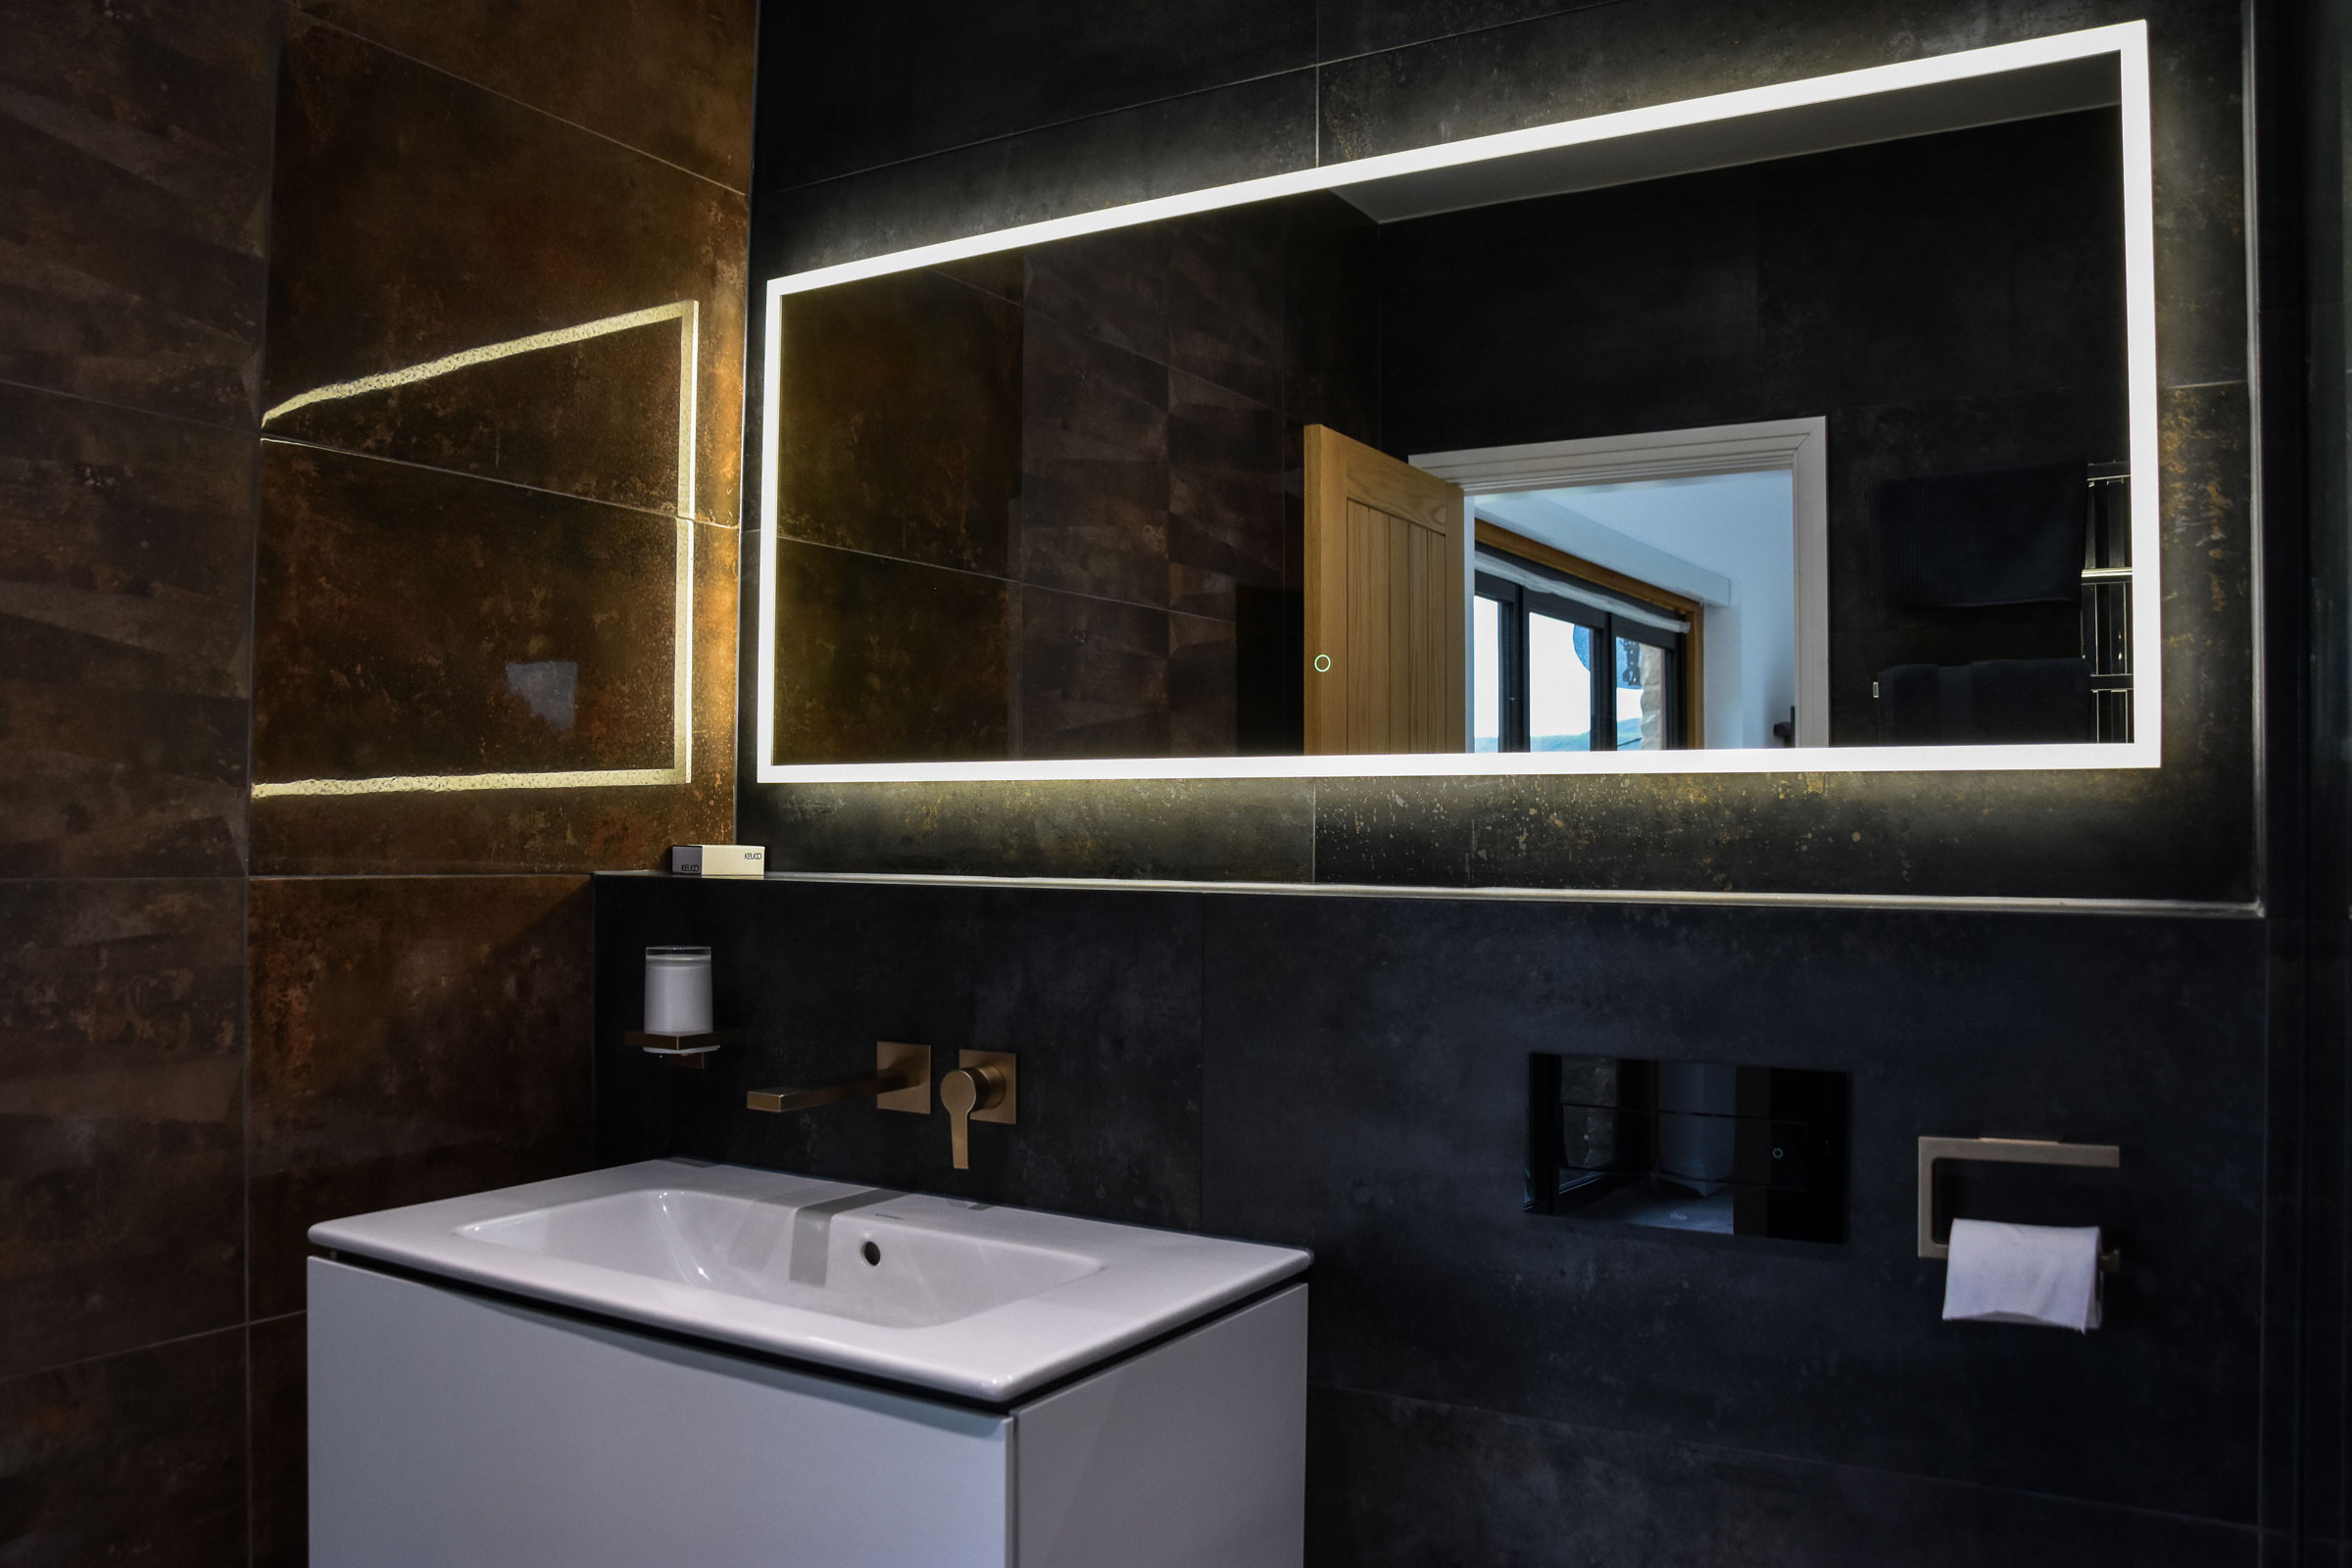 garth & julie, their master bathroom case study image horizontal image 1